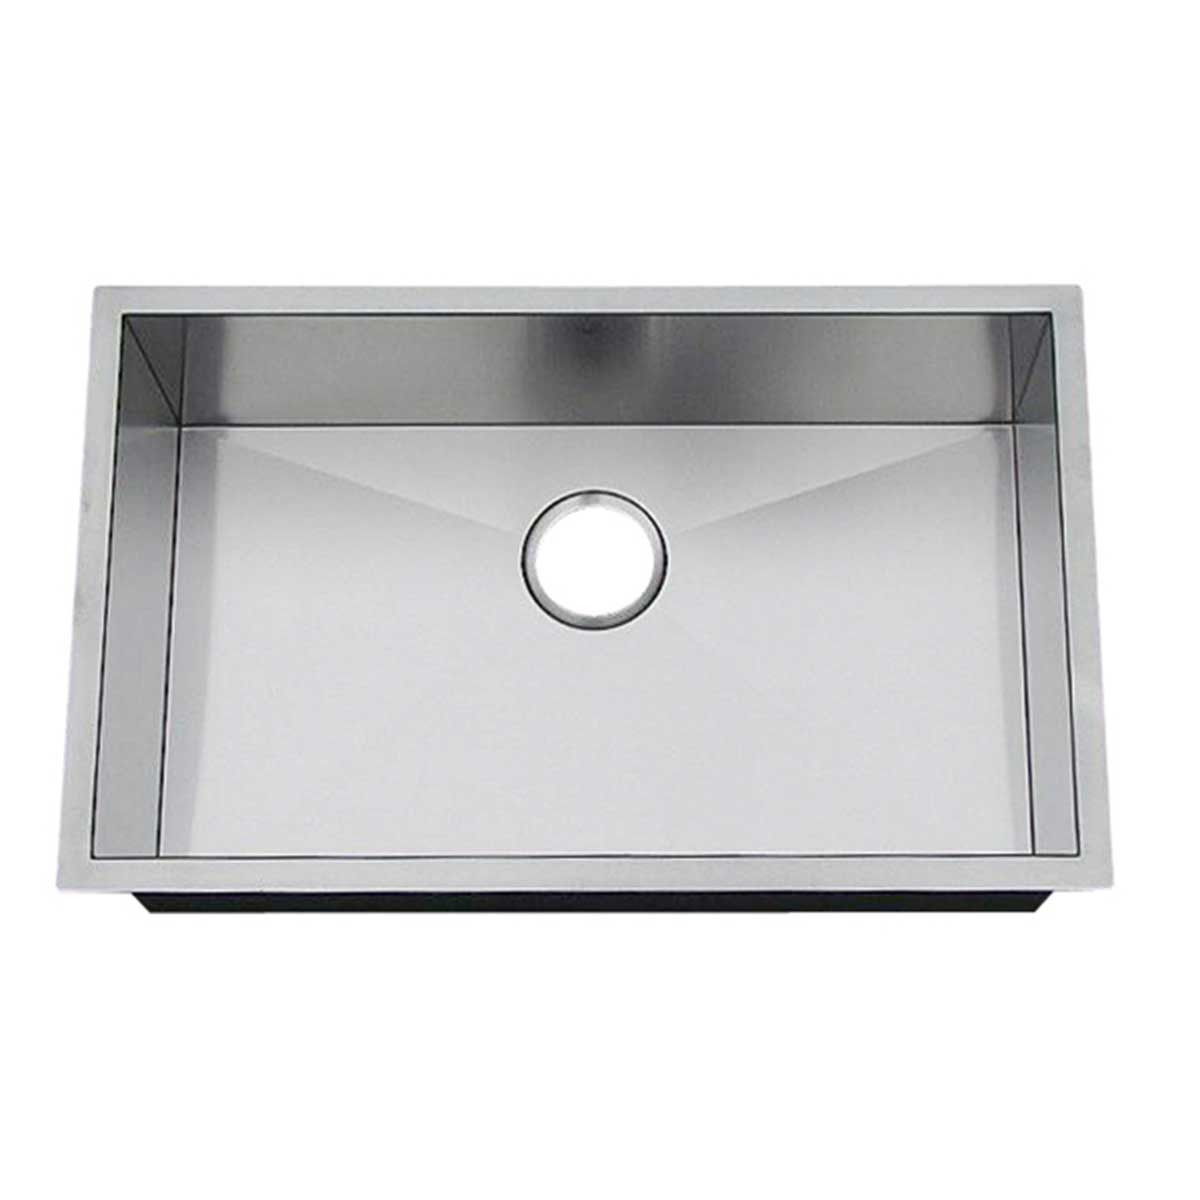 CPUZ2919-D10 Artisan Chef Pro Sink